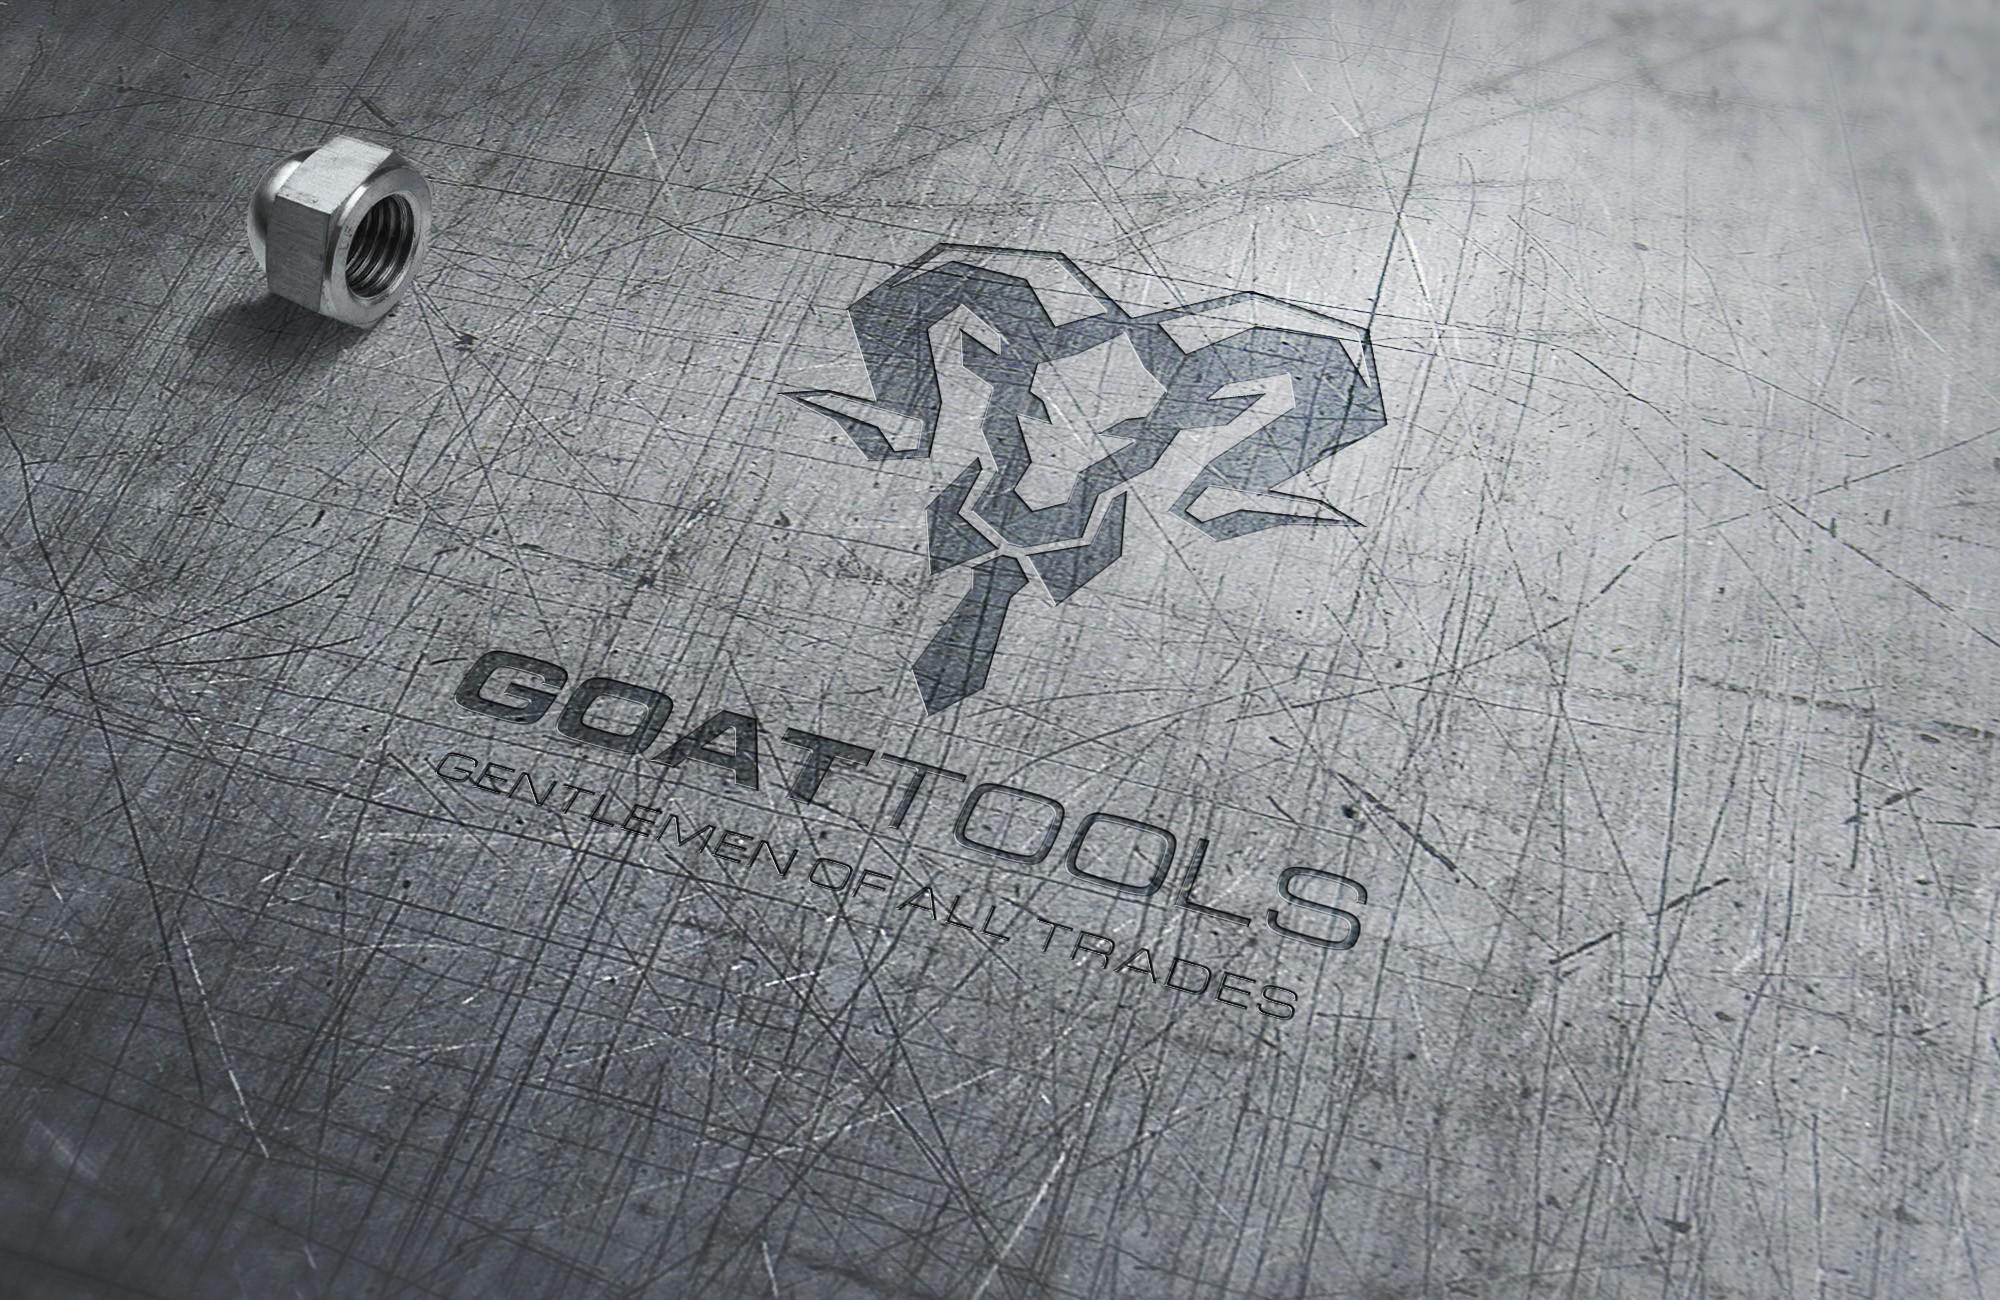 New multi-tool company needs a classic geometric goat face logo.